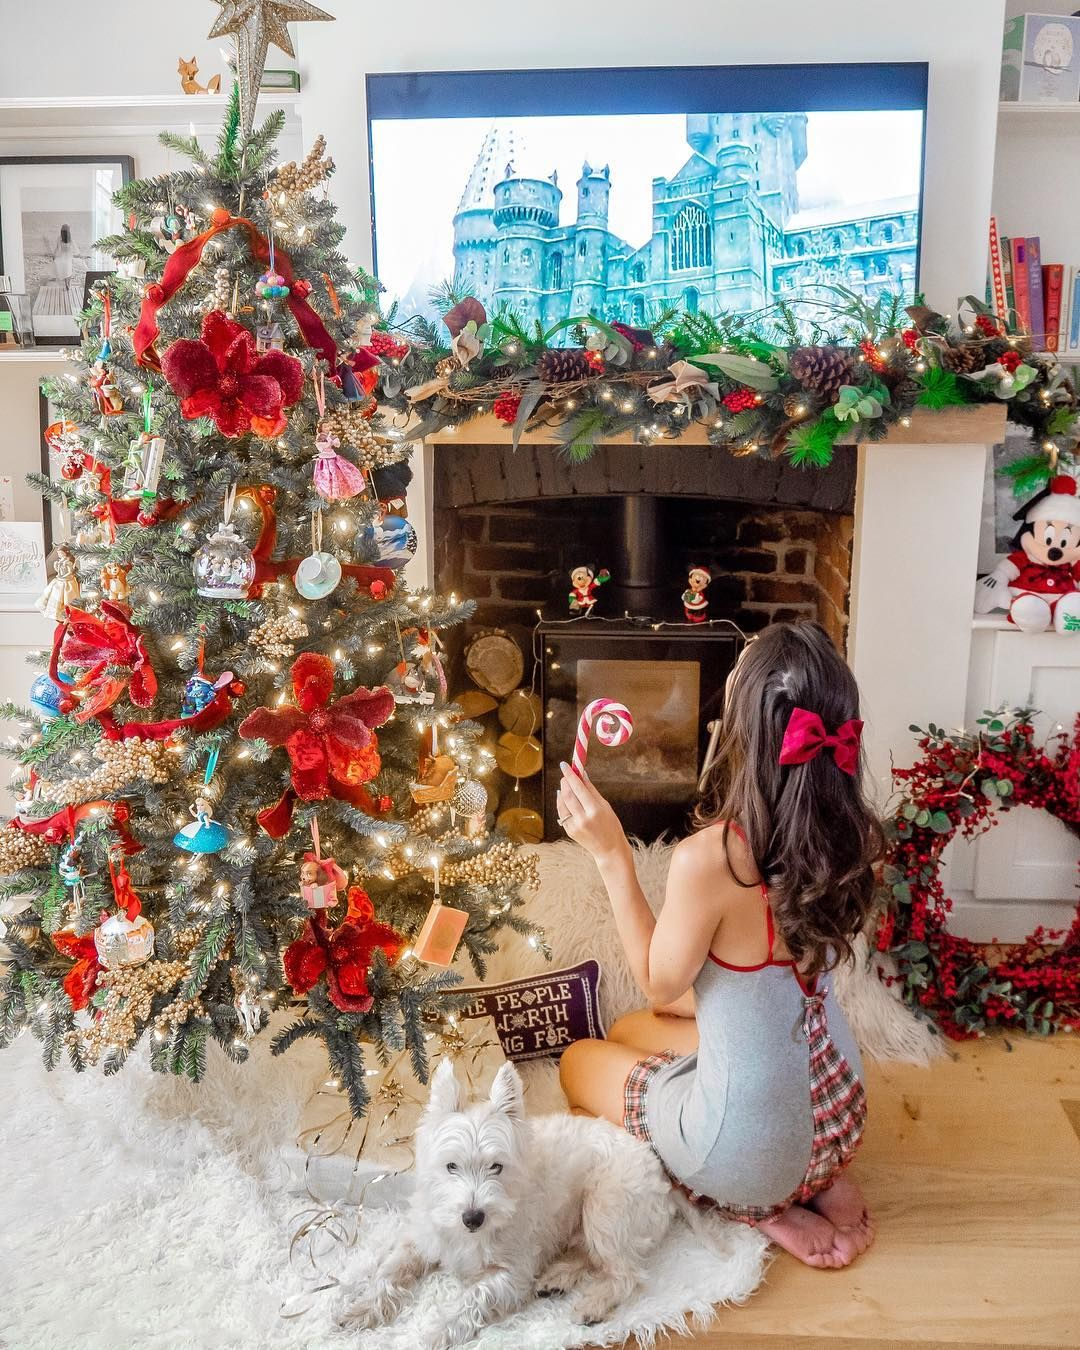 When Is Little Christmas.Jordan Emily Brown On Instagram A Merry Little Christmas